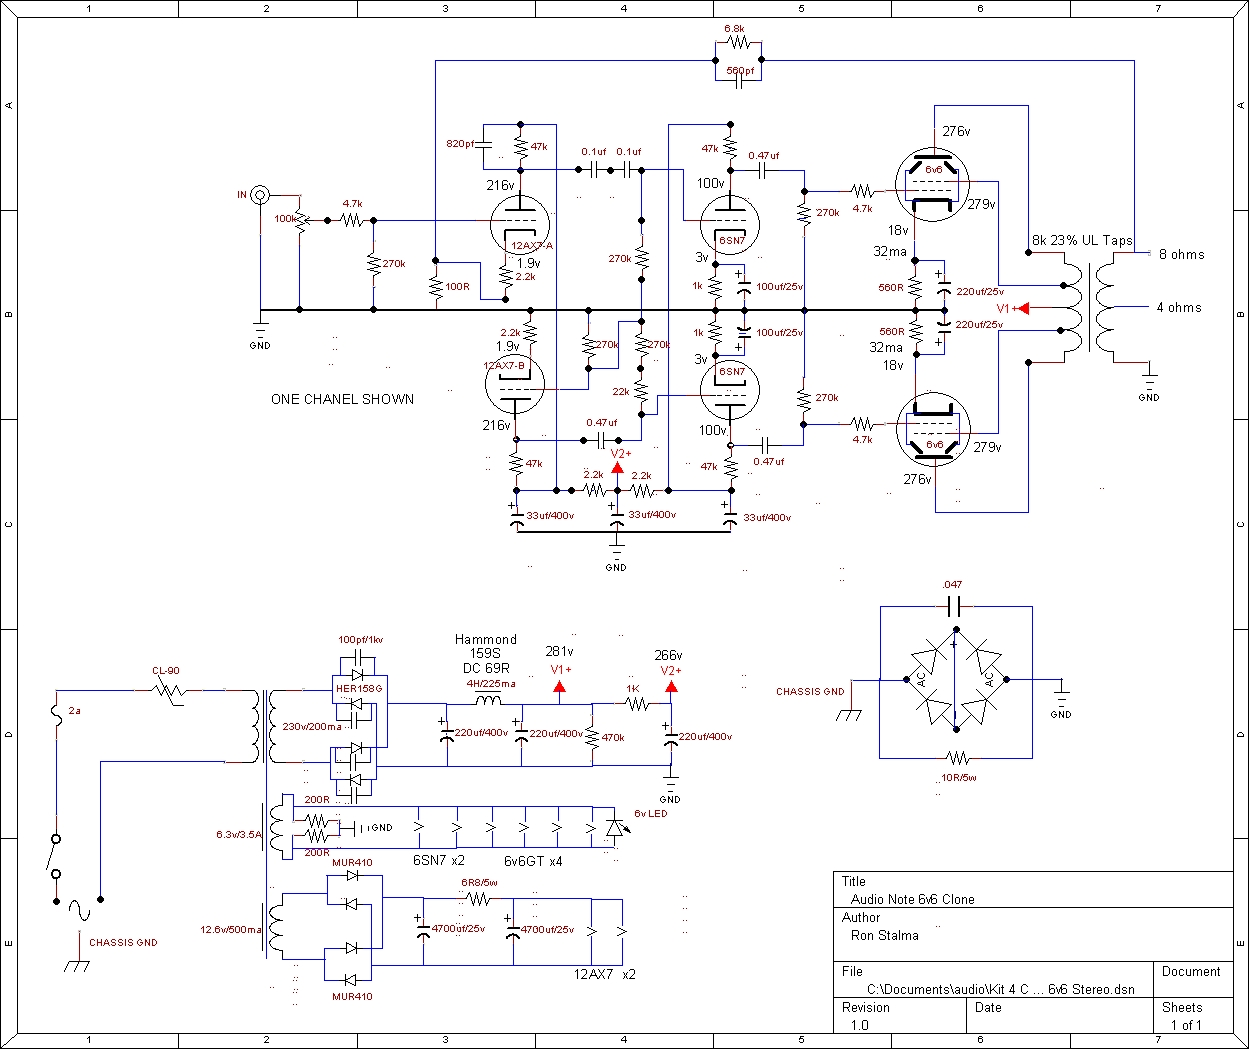 Audionote 6v6 Kit 4 clone Schematic